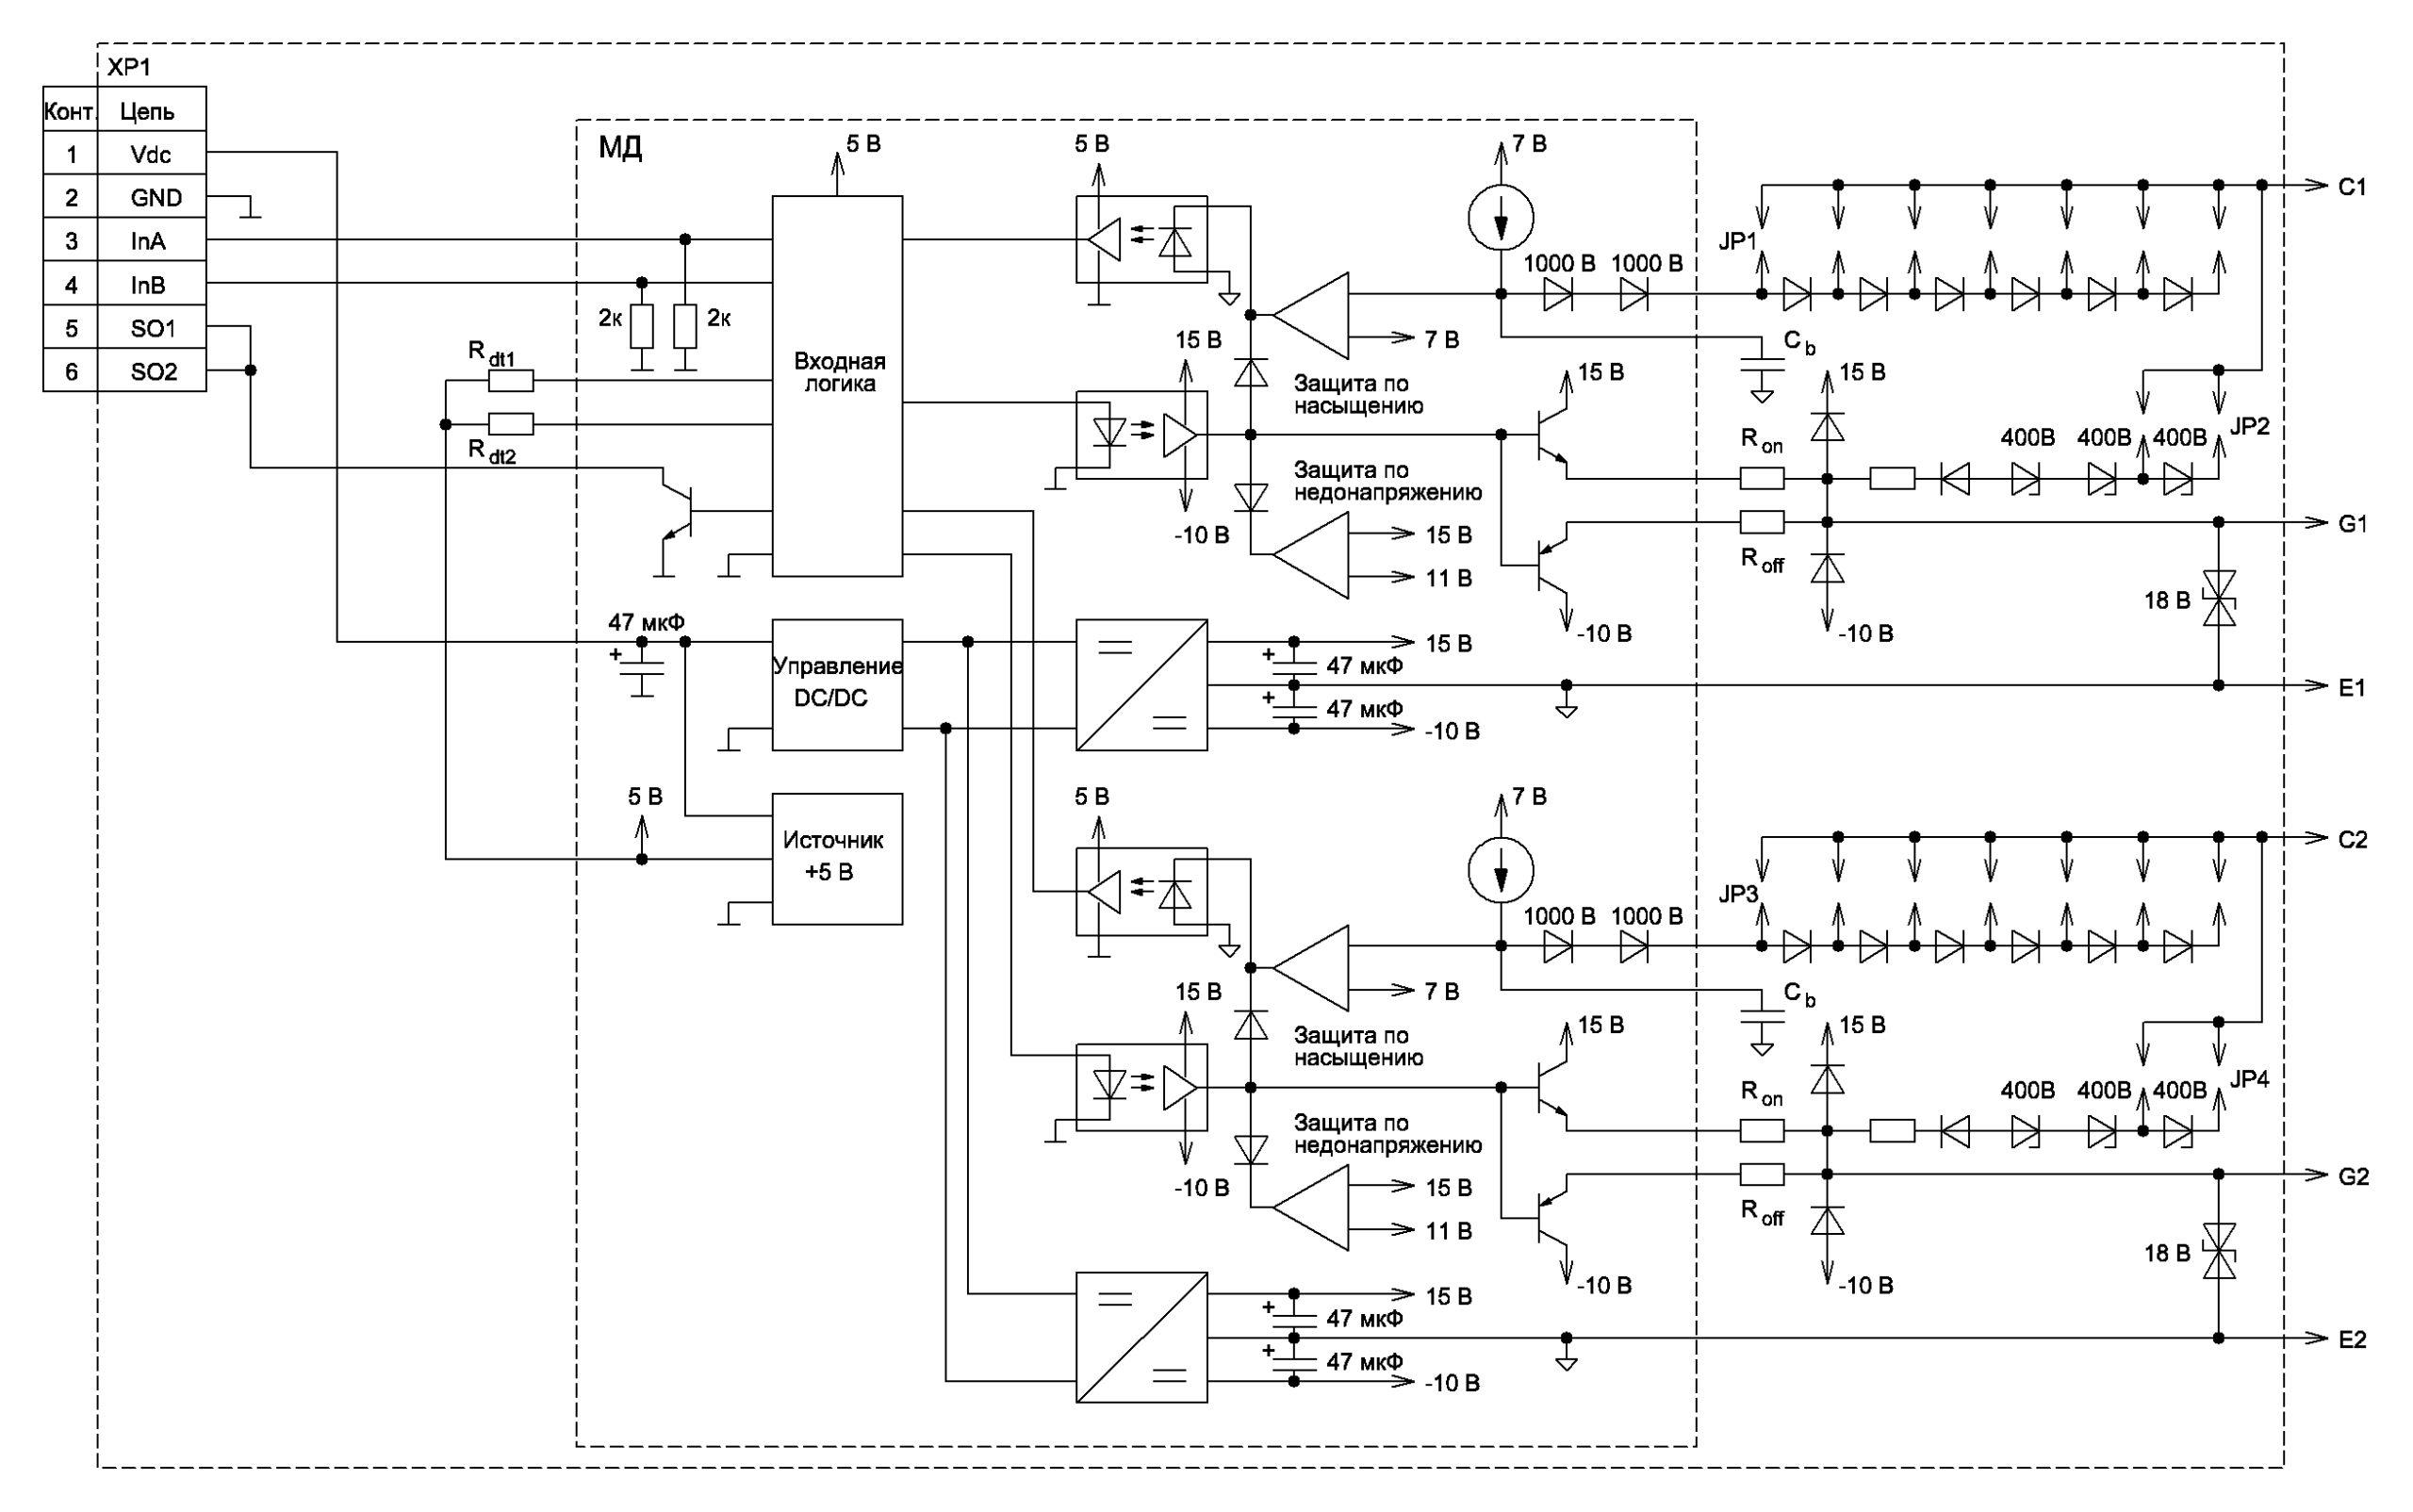 Структурная схема базового драйвера-аналога